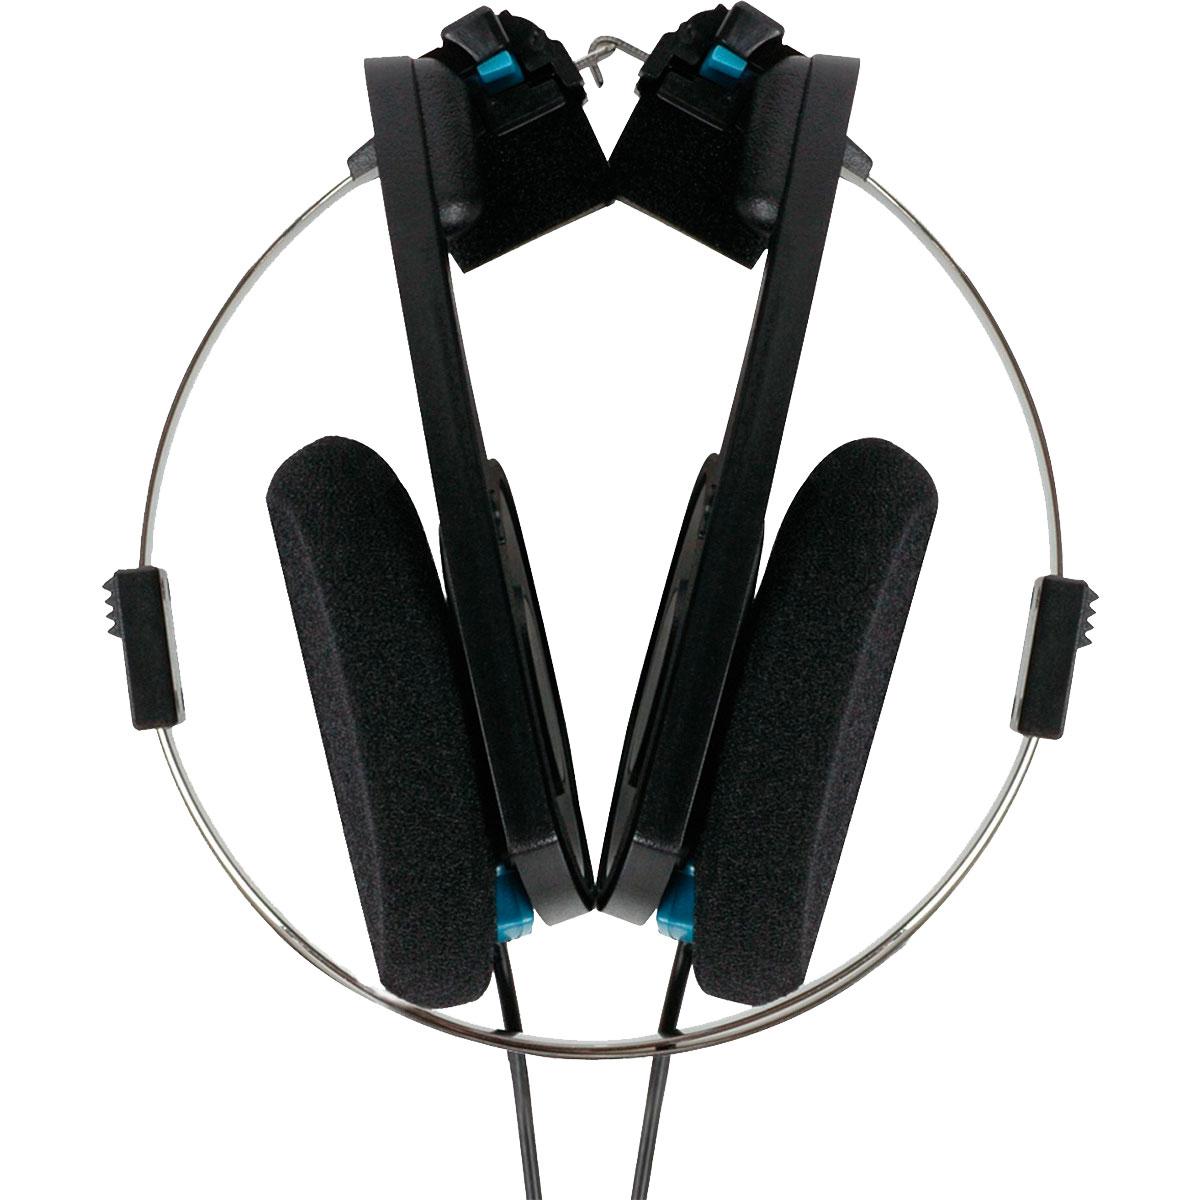 PortaPRO - Fone de Ouvido On-ear Profissional para Retorno de Bandas Porta PRO com Garantia Vital�cia KOSS